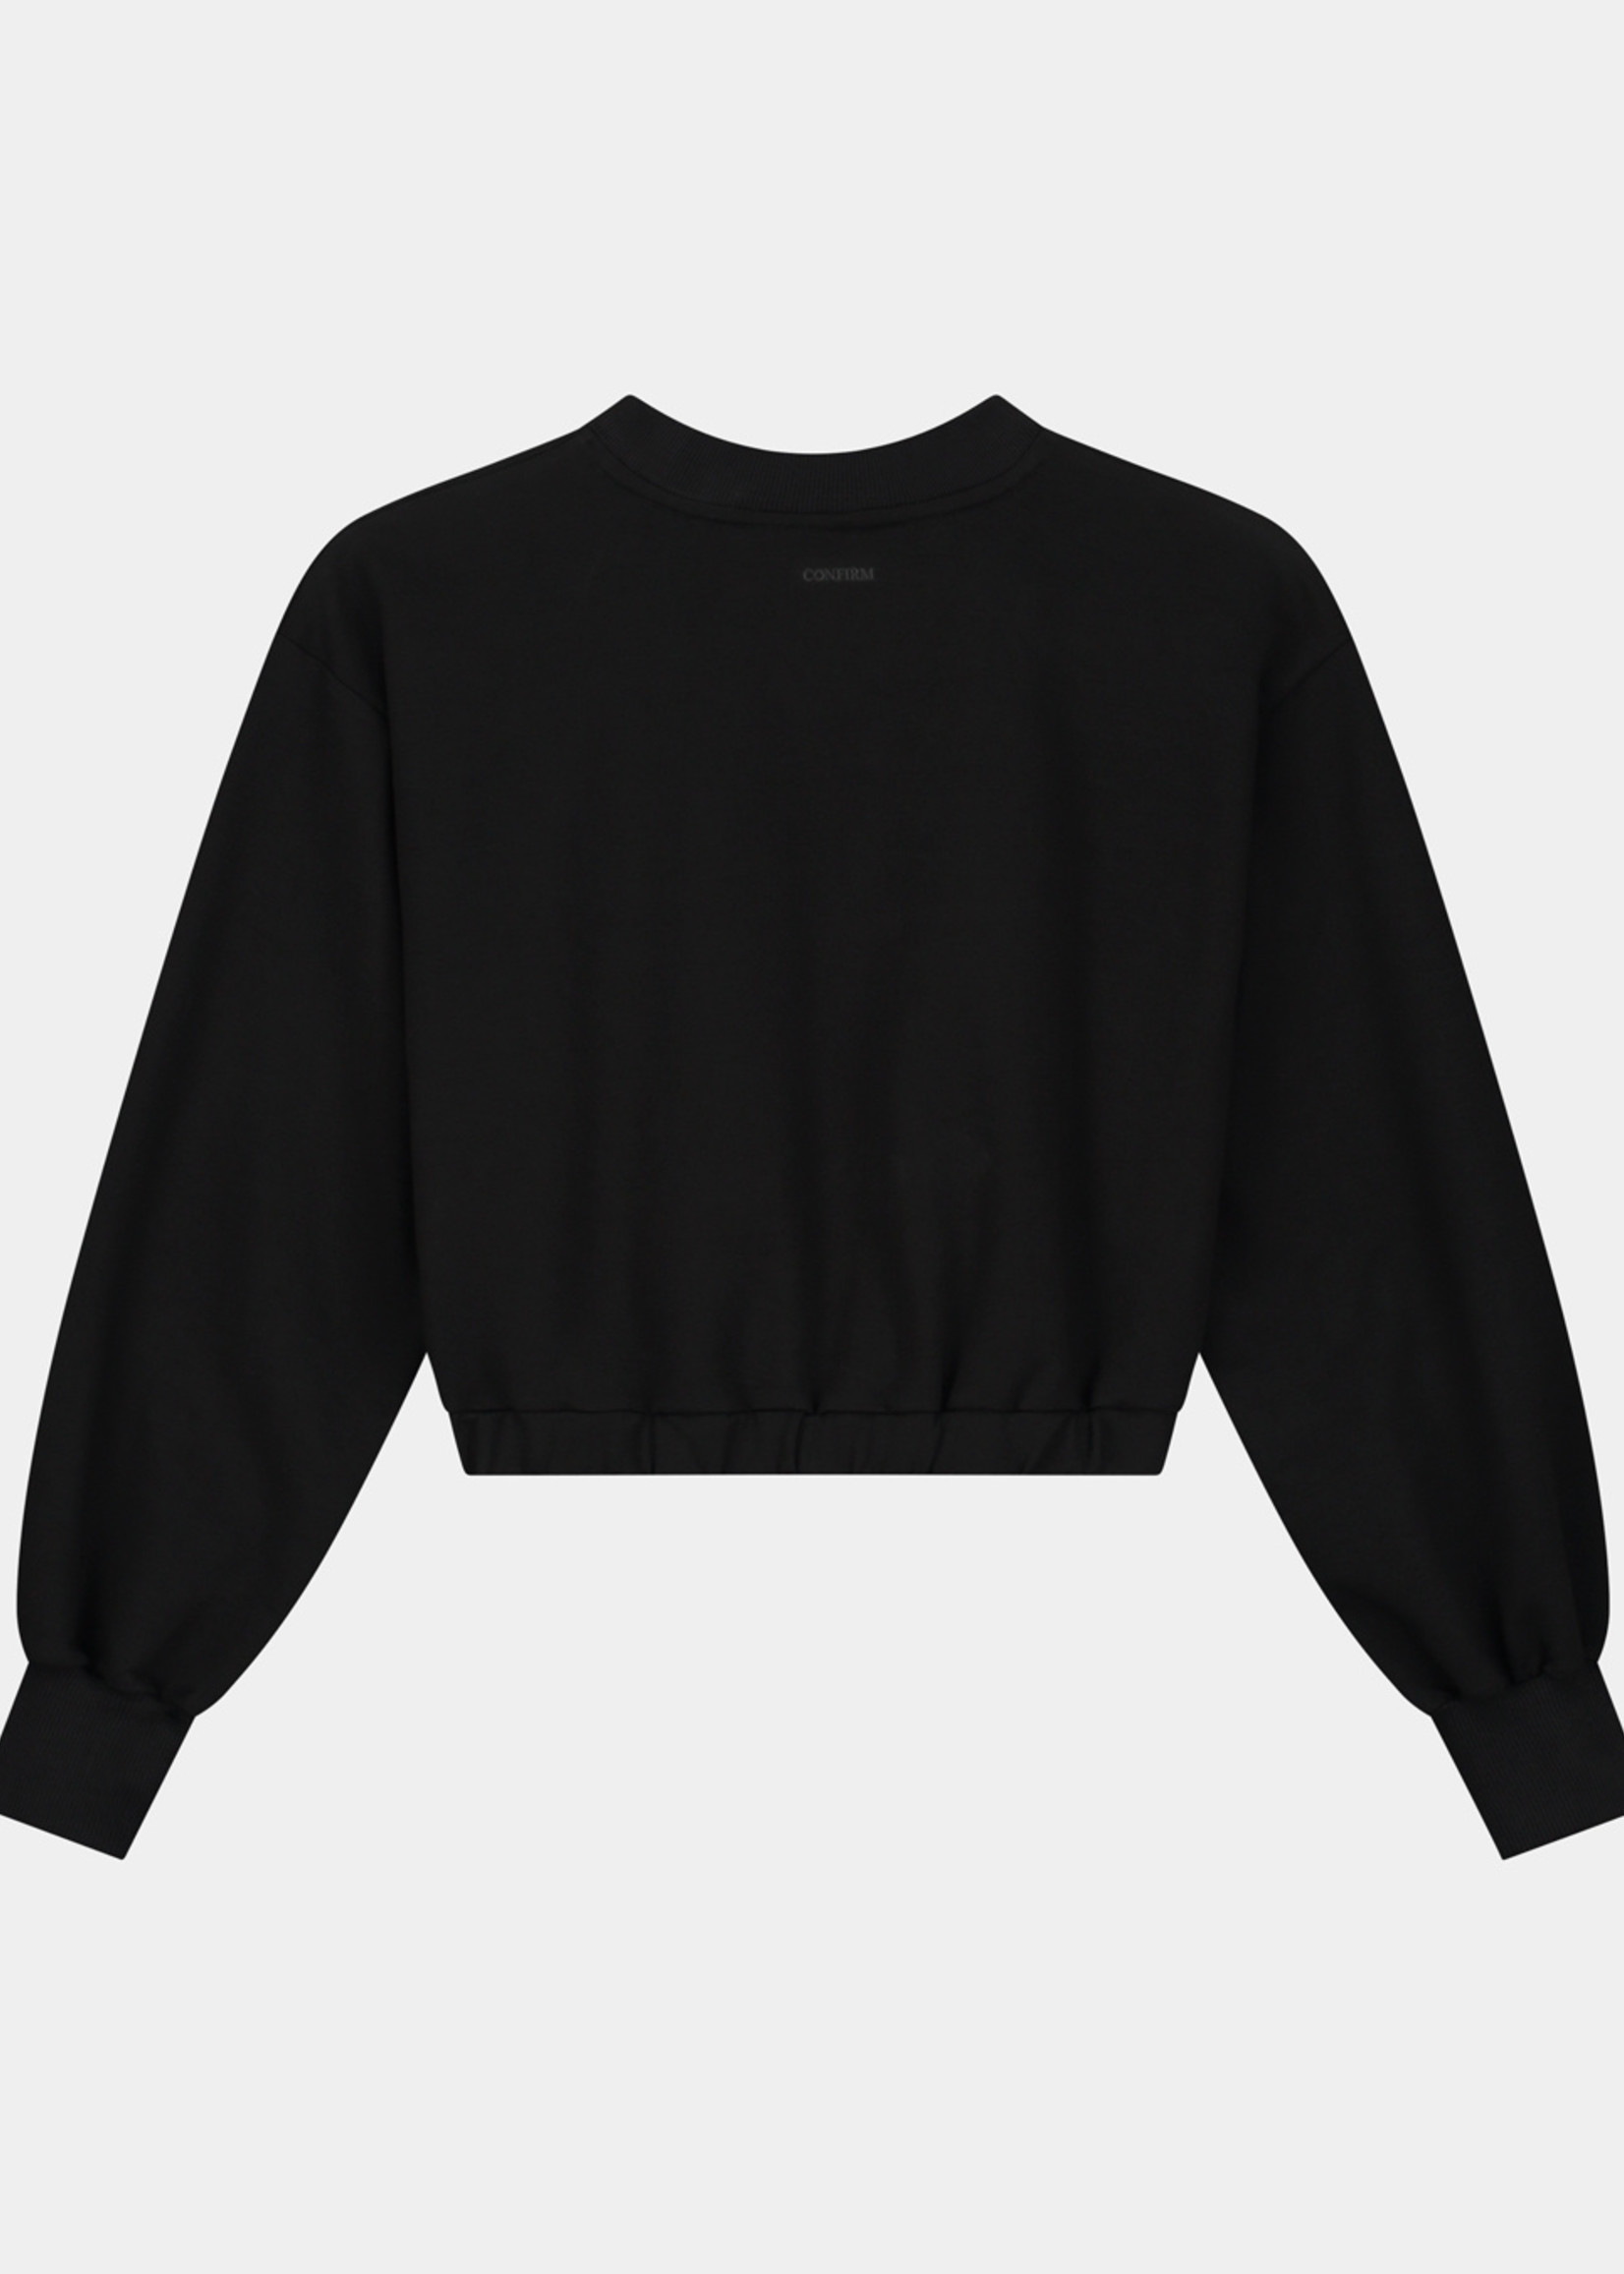 Confirm Caramella crop top - zwart